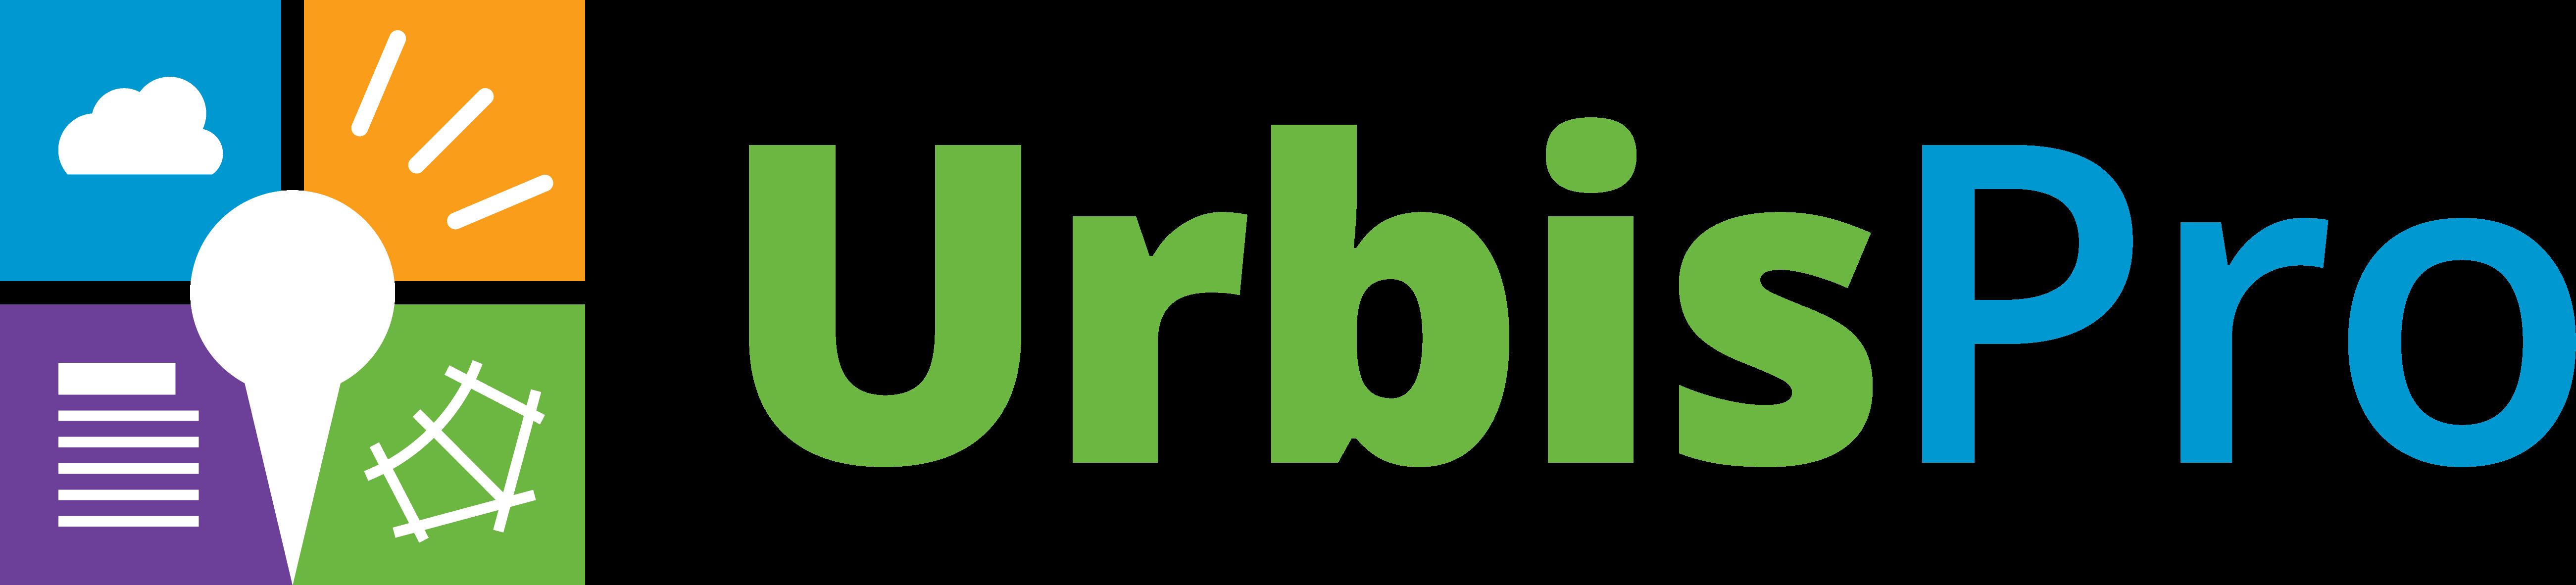 Urbis Pro Integration